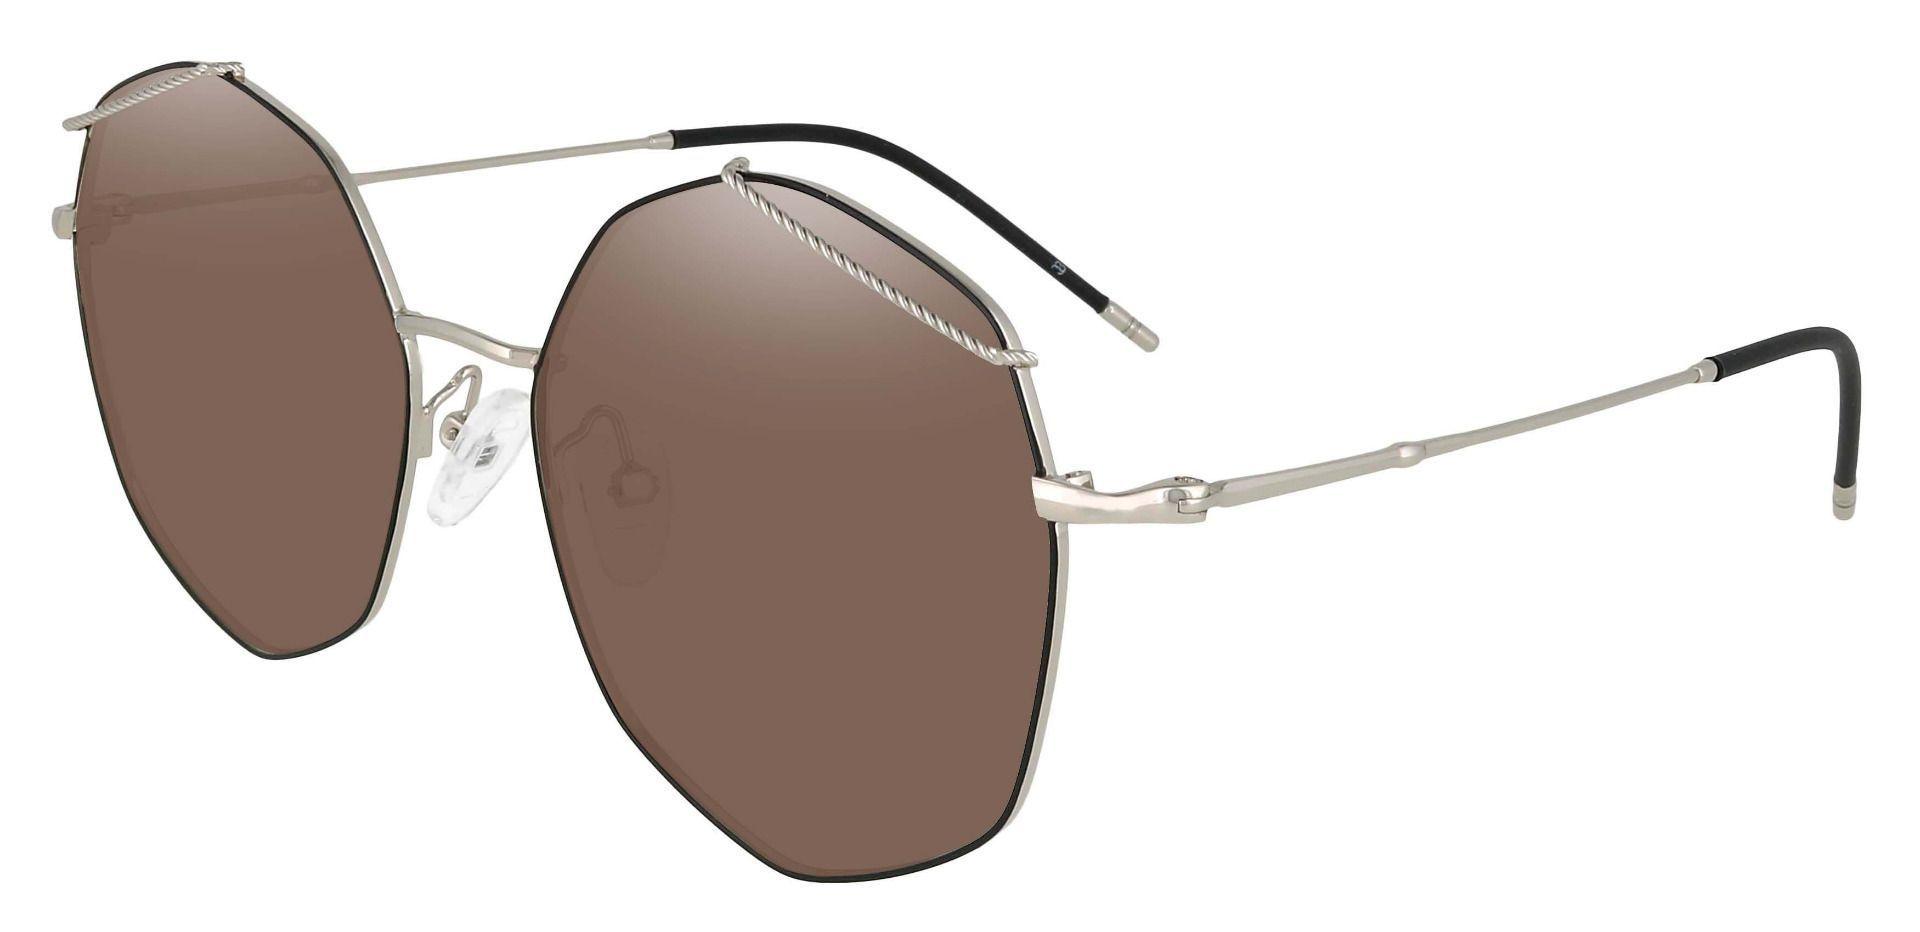 Tango Geometric Prescription Sunglasses - Black Frame With Brown Lenses